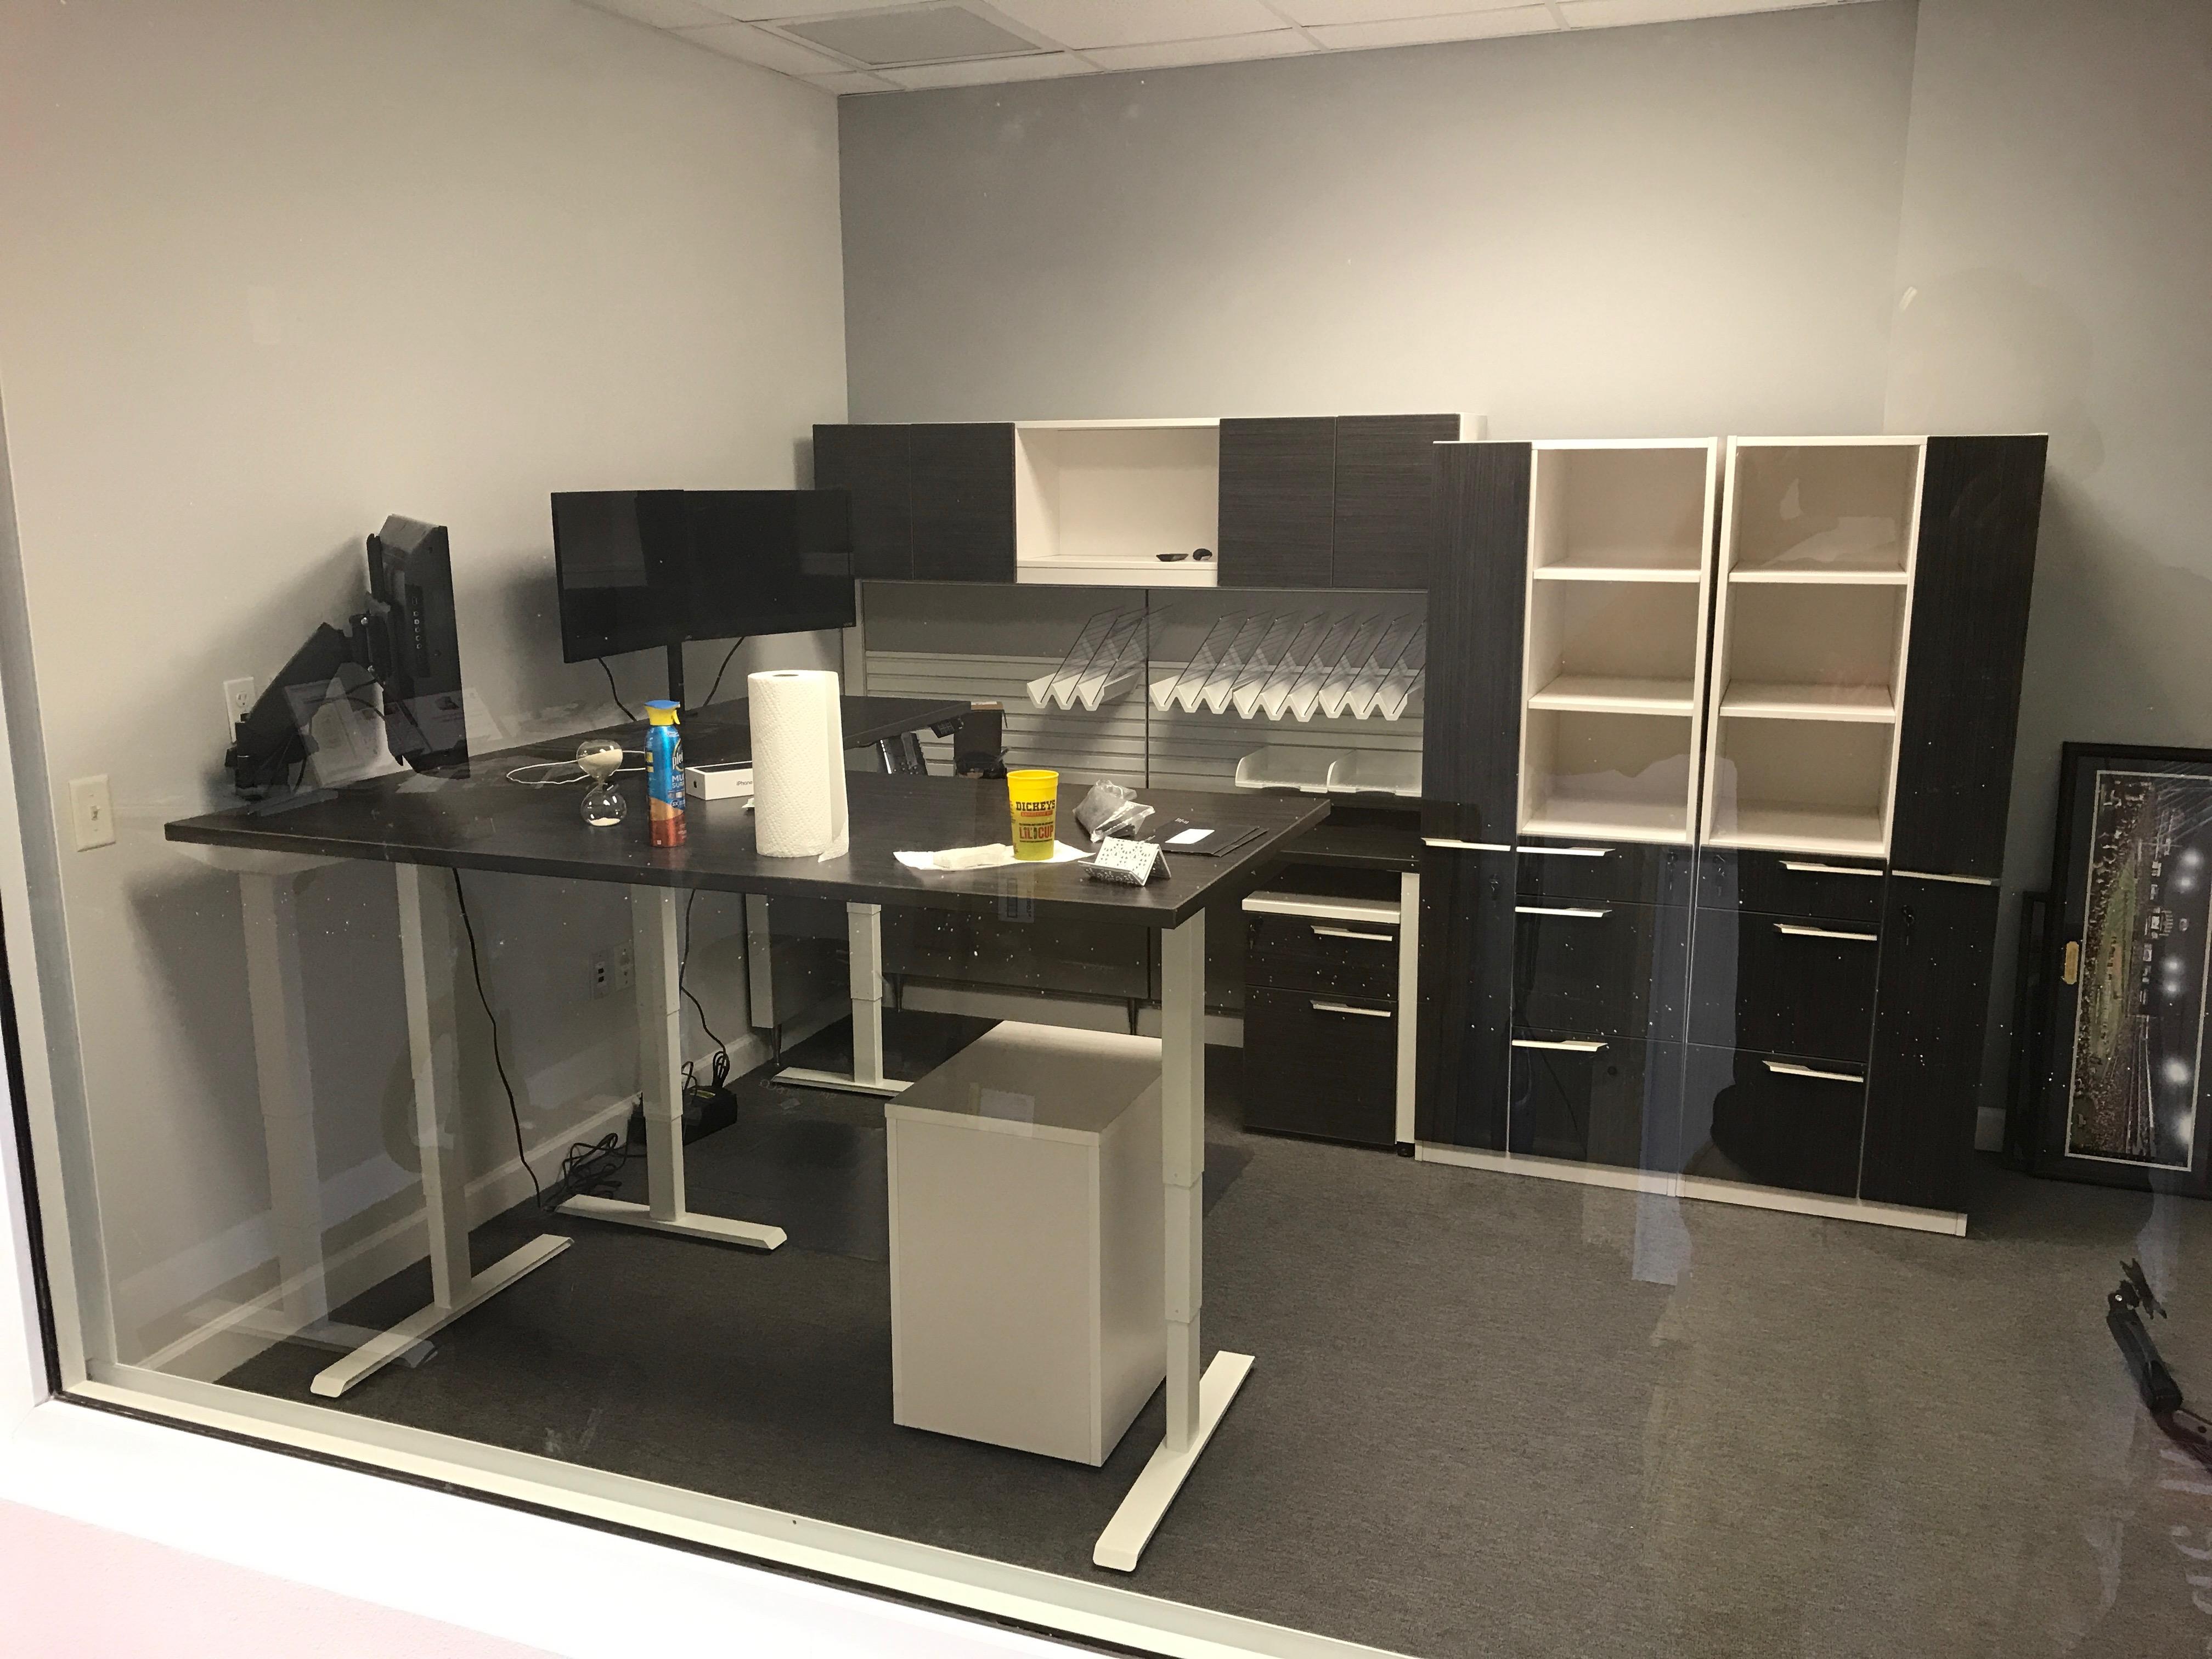 manasota-office-supplies-llc-adjustable-tables-in-bradenton-florida-manasota-office-supplies-llc-16-.jpg